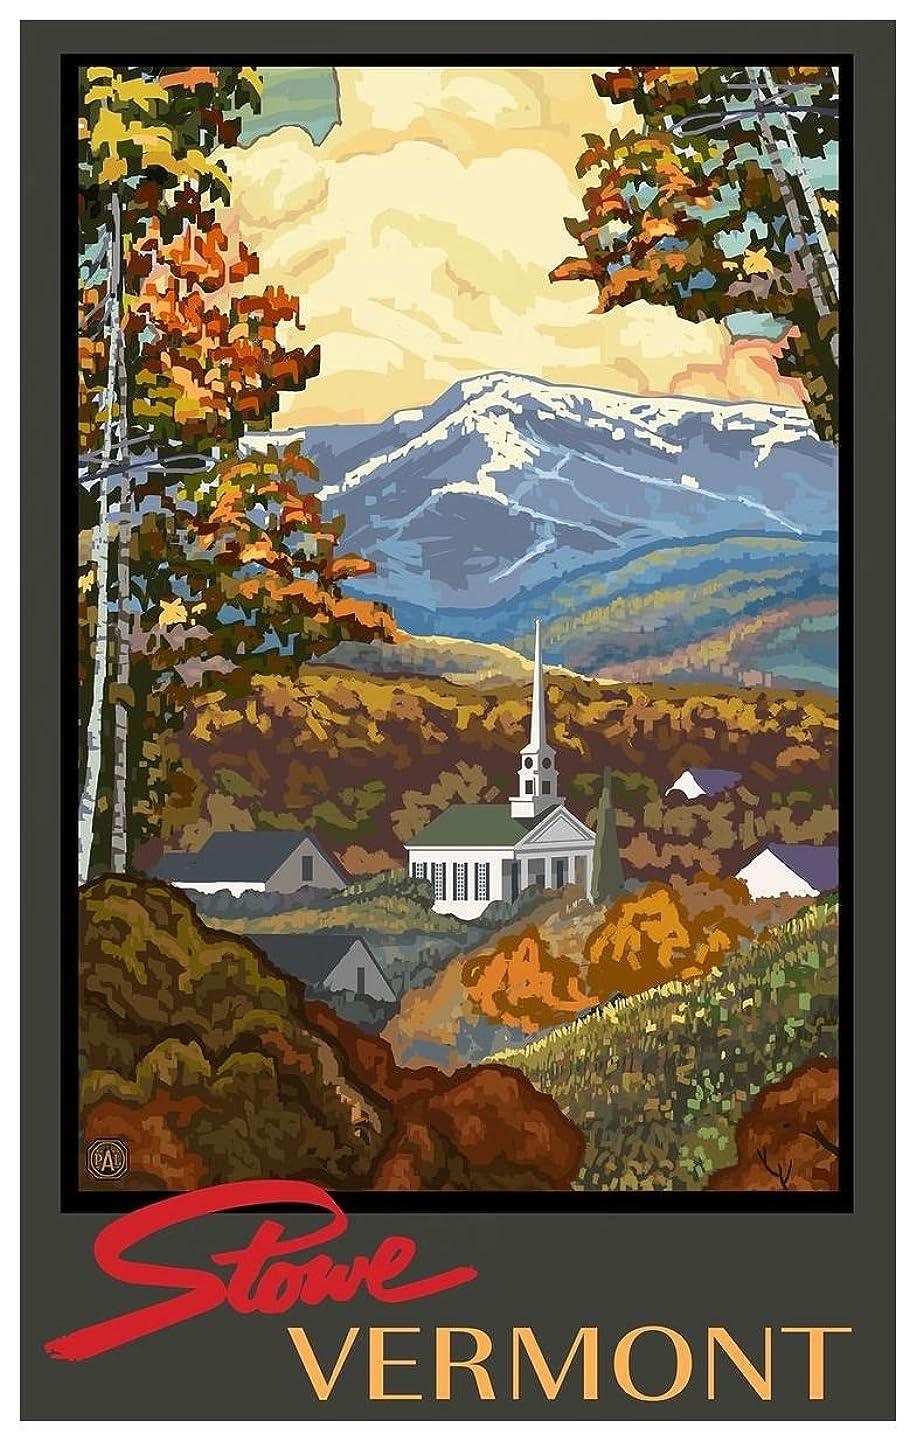 Stowe Vermont Church Travel Art Print Poster by Paul A. Lanquist (12